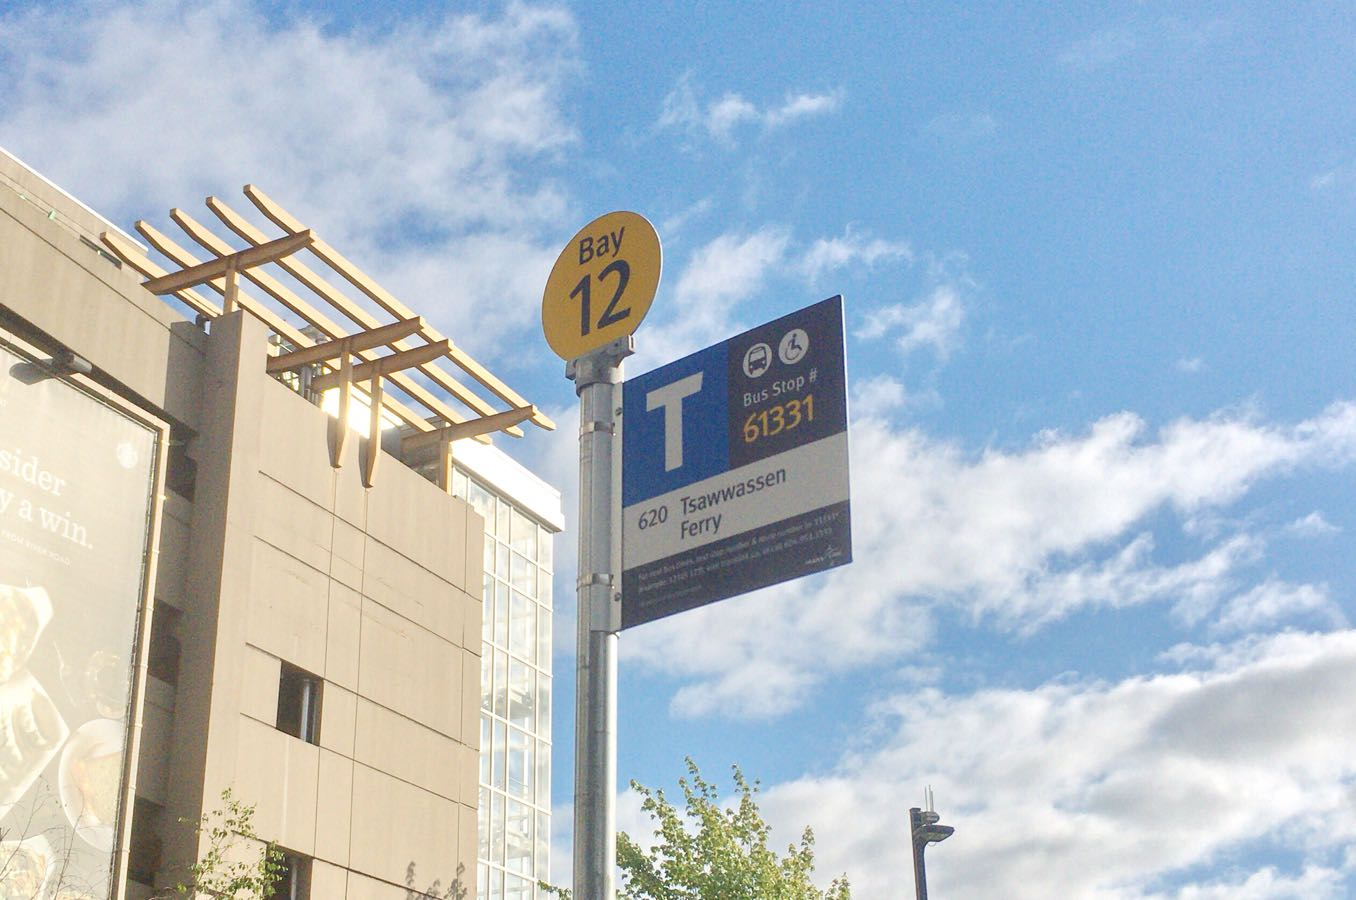 Tsawwassen(ツワッセン)行きのバス停